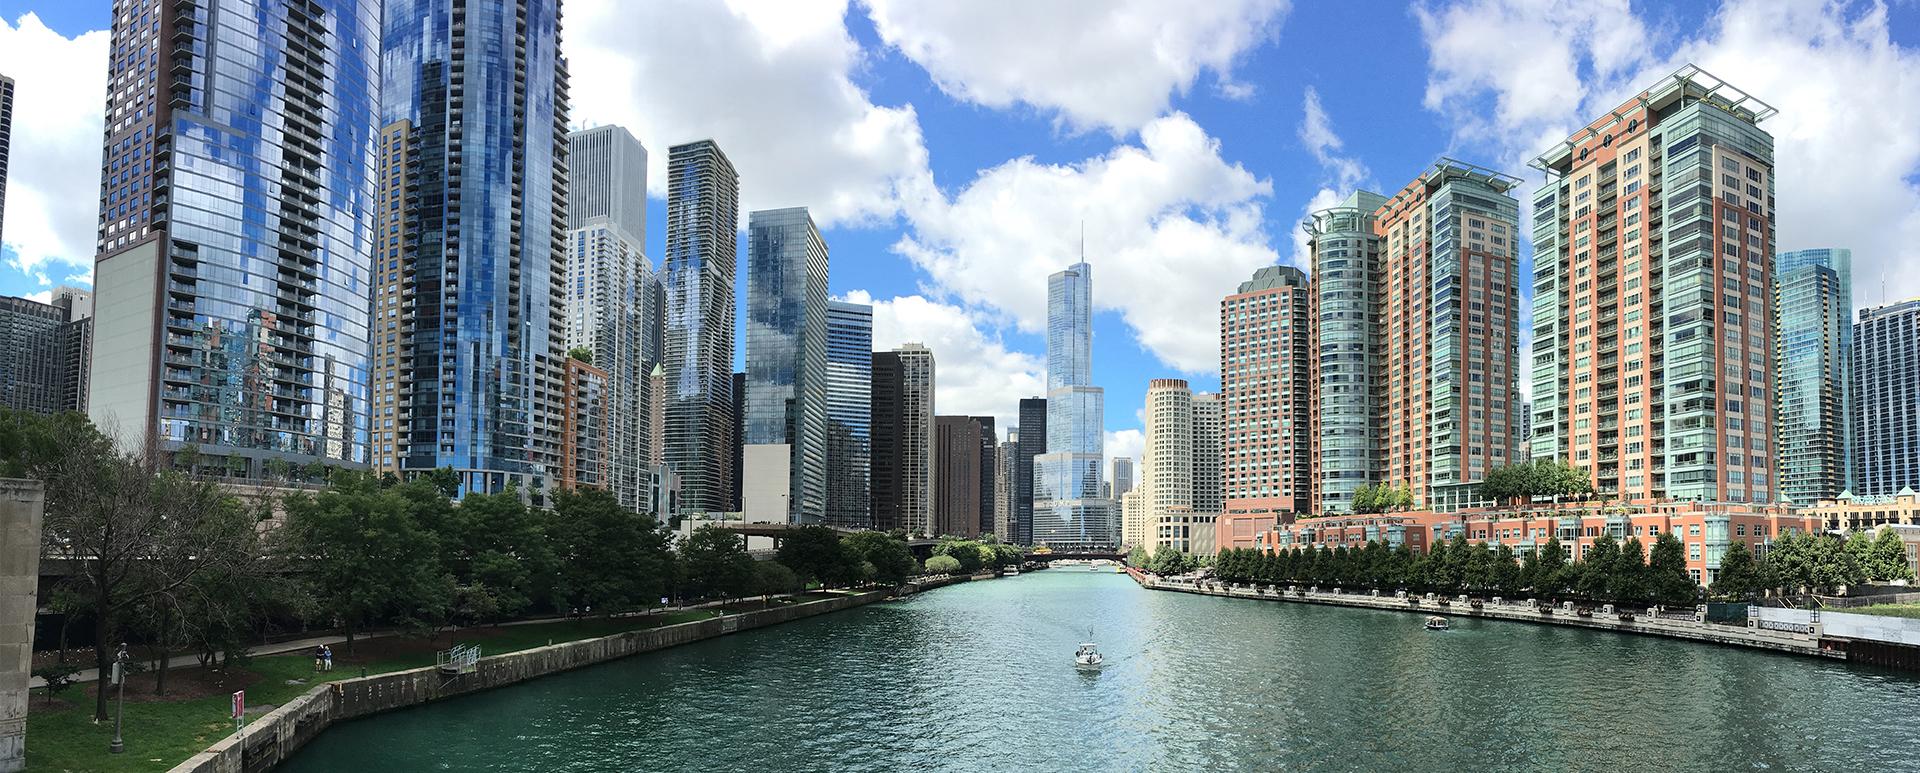 maha contact us Chicago